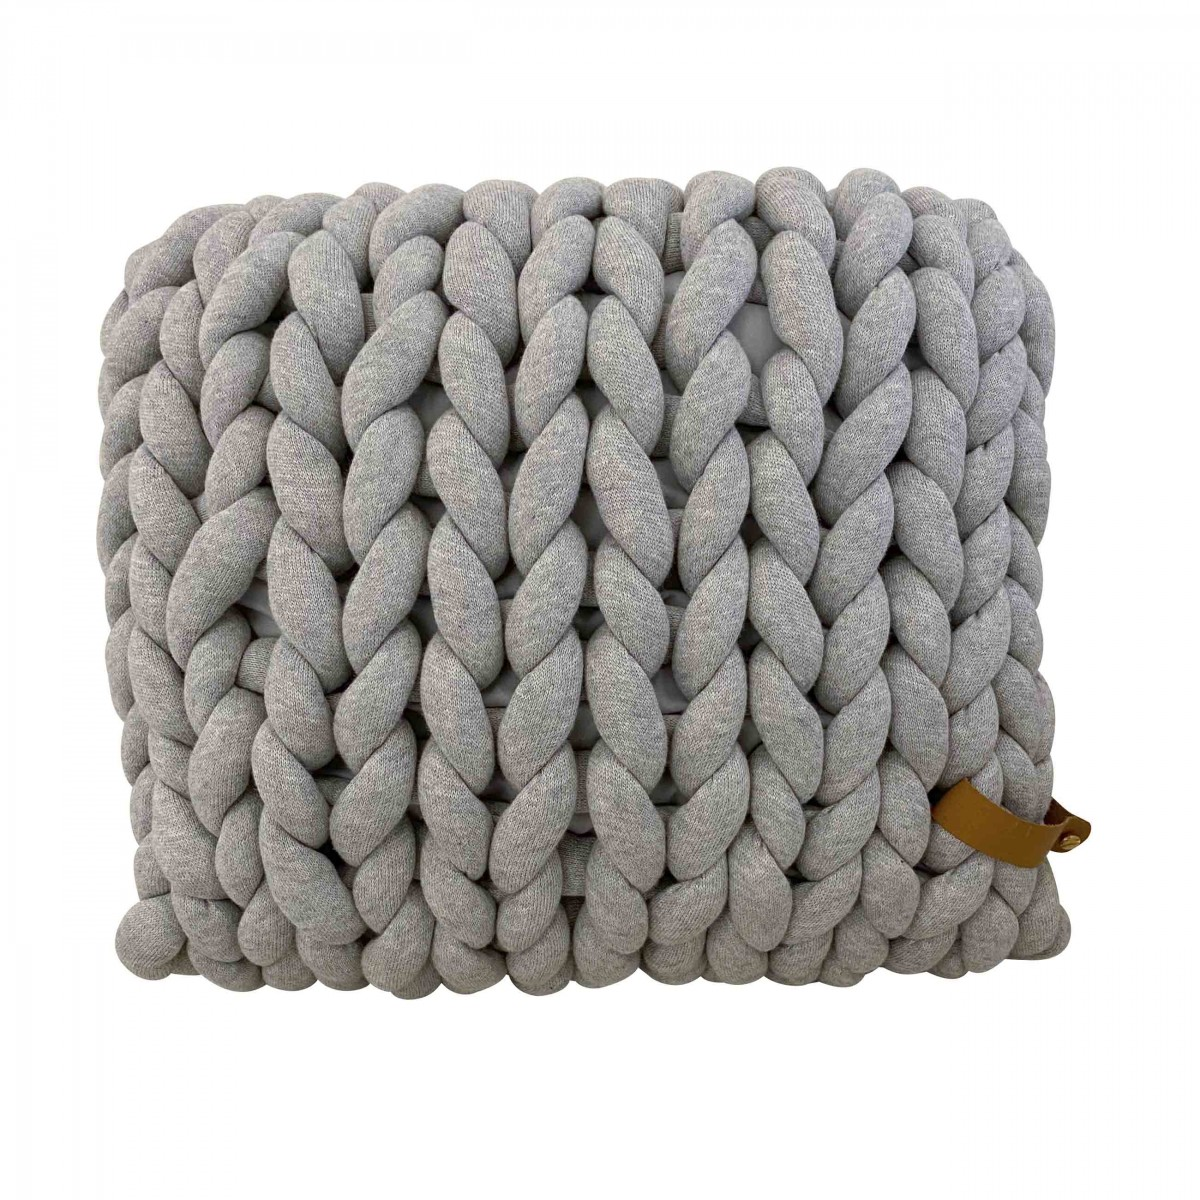 adorist - XXL Grobstrick Cotton Tube Kissen 45x40cm, hellgrau